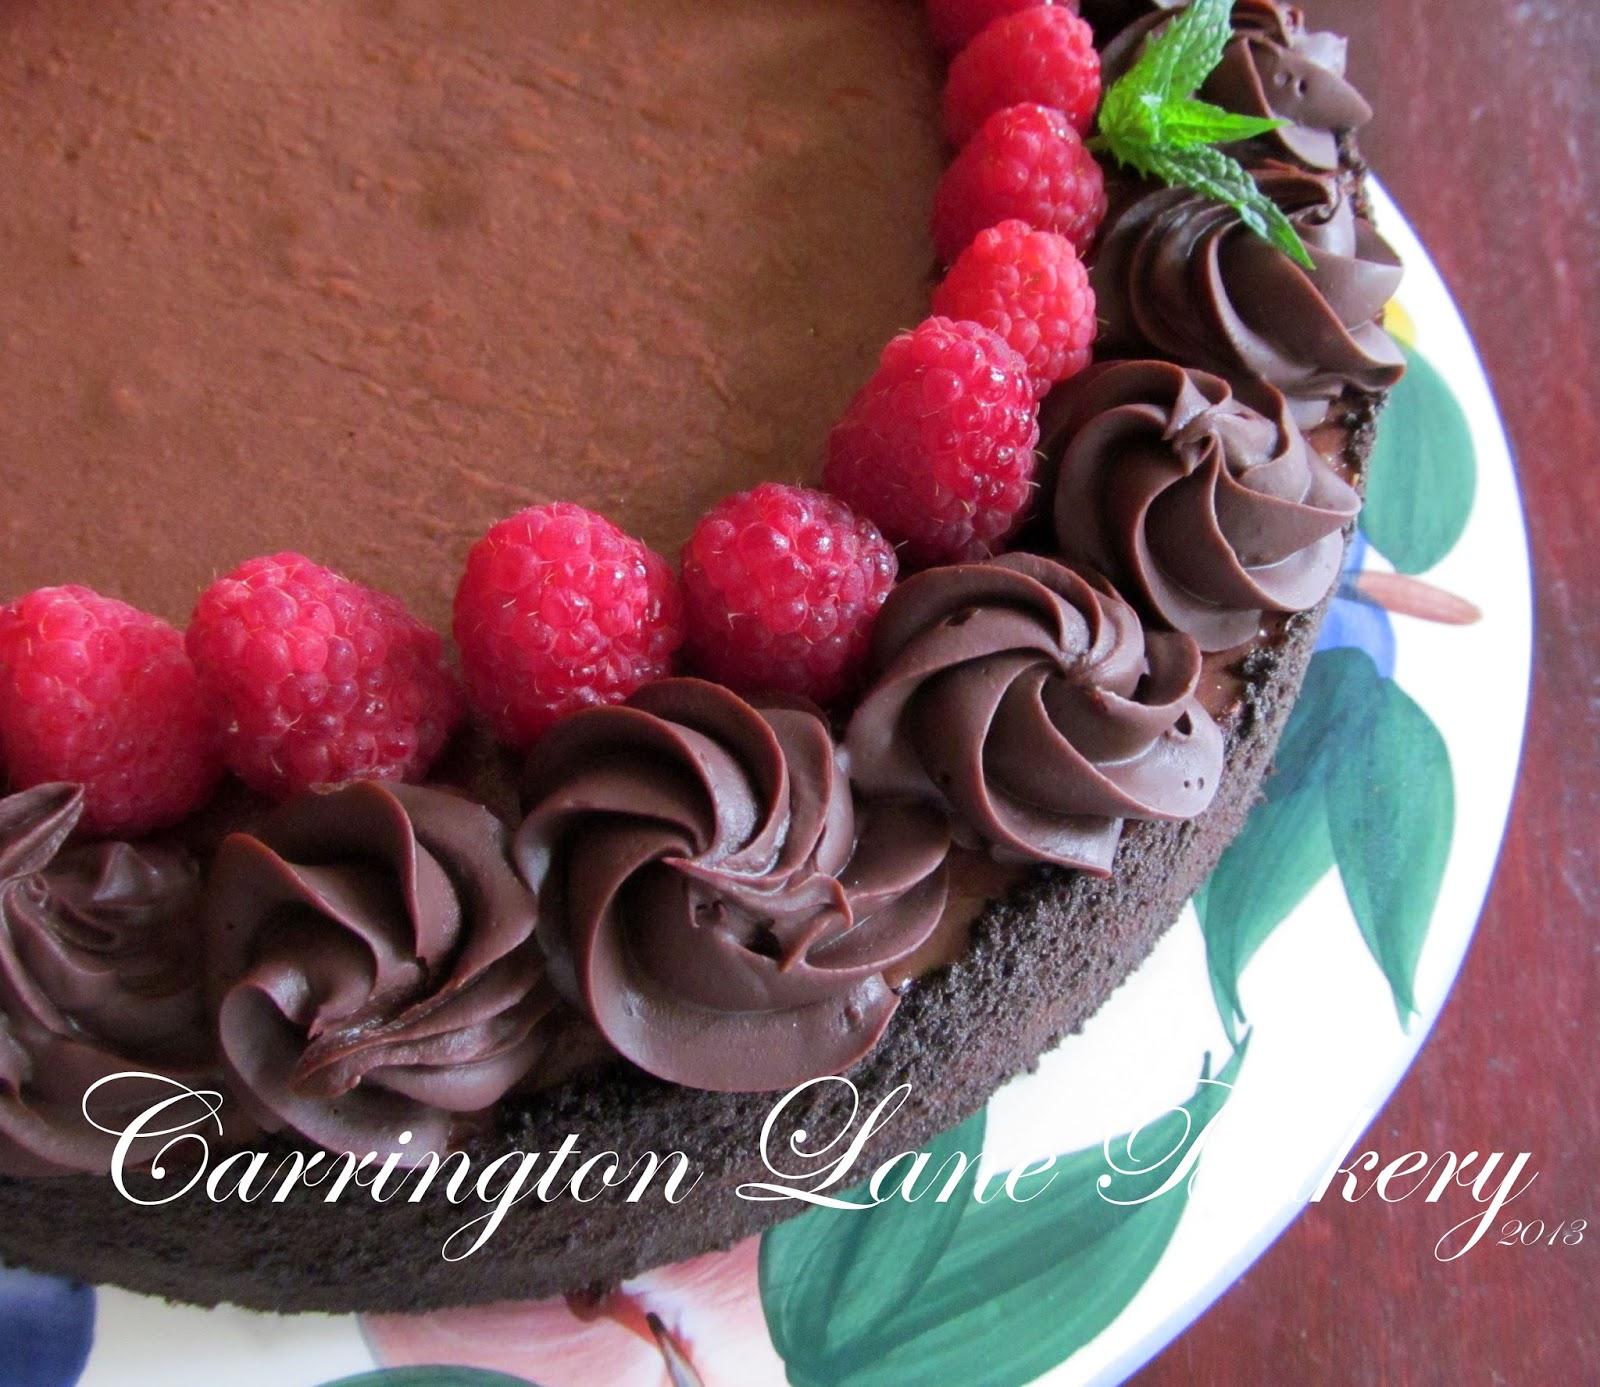 Carrington Lane Bakery Moms Birthday Chocolate Cheese Cake